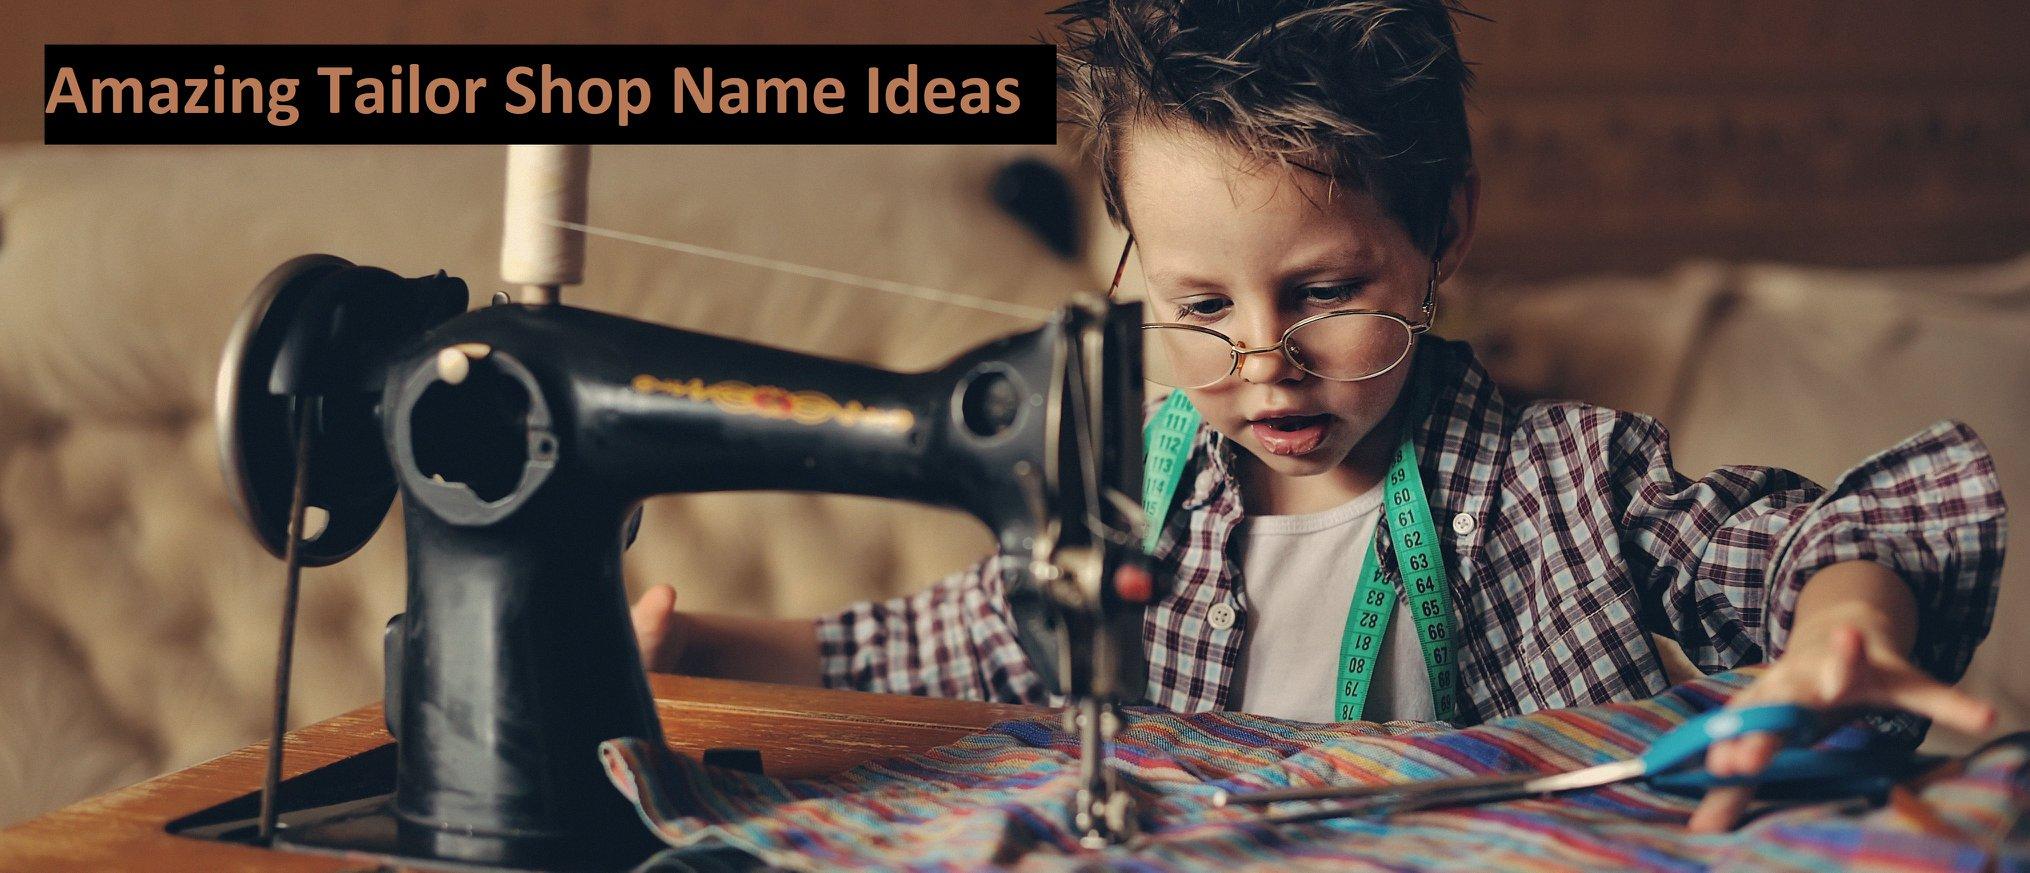 Attractive Tailor Shop Name Ideas